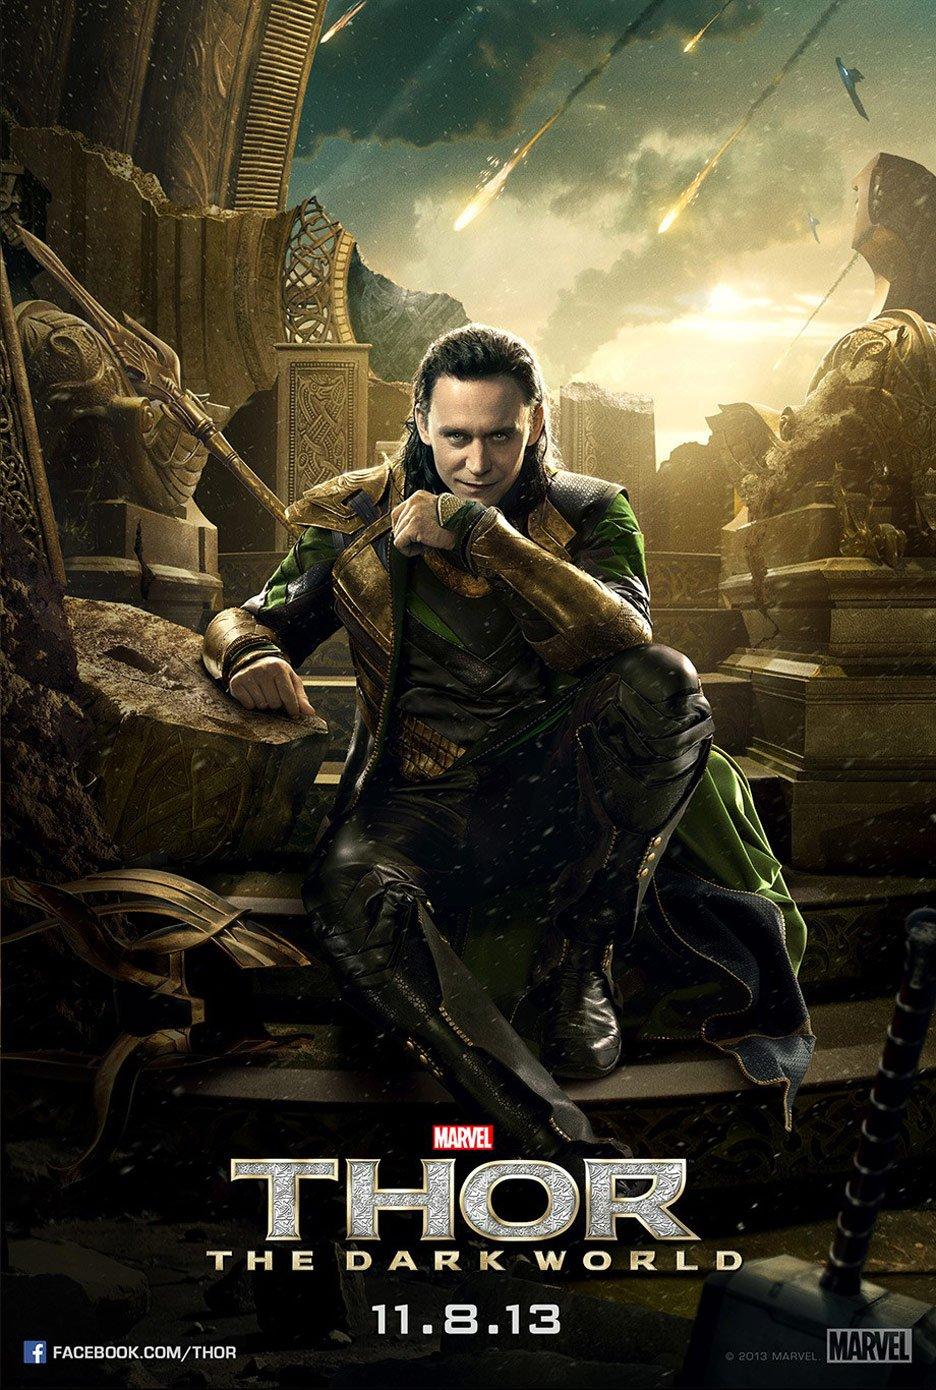 Thor: The Dark World Poster #4